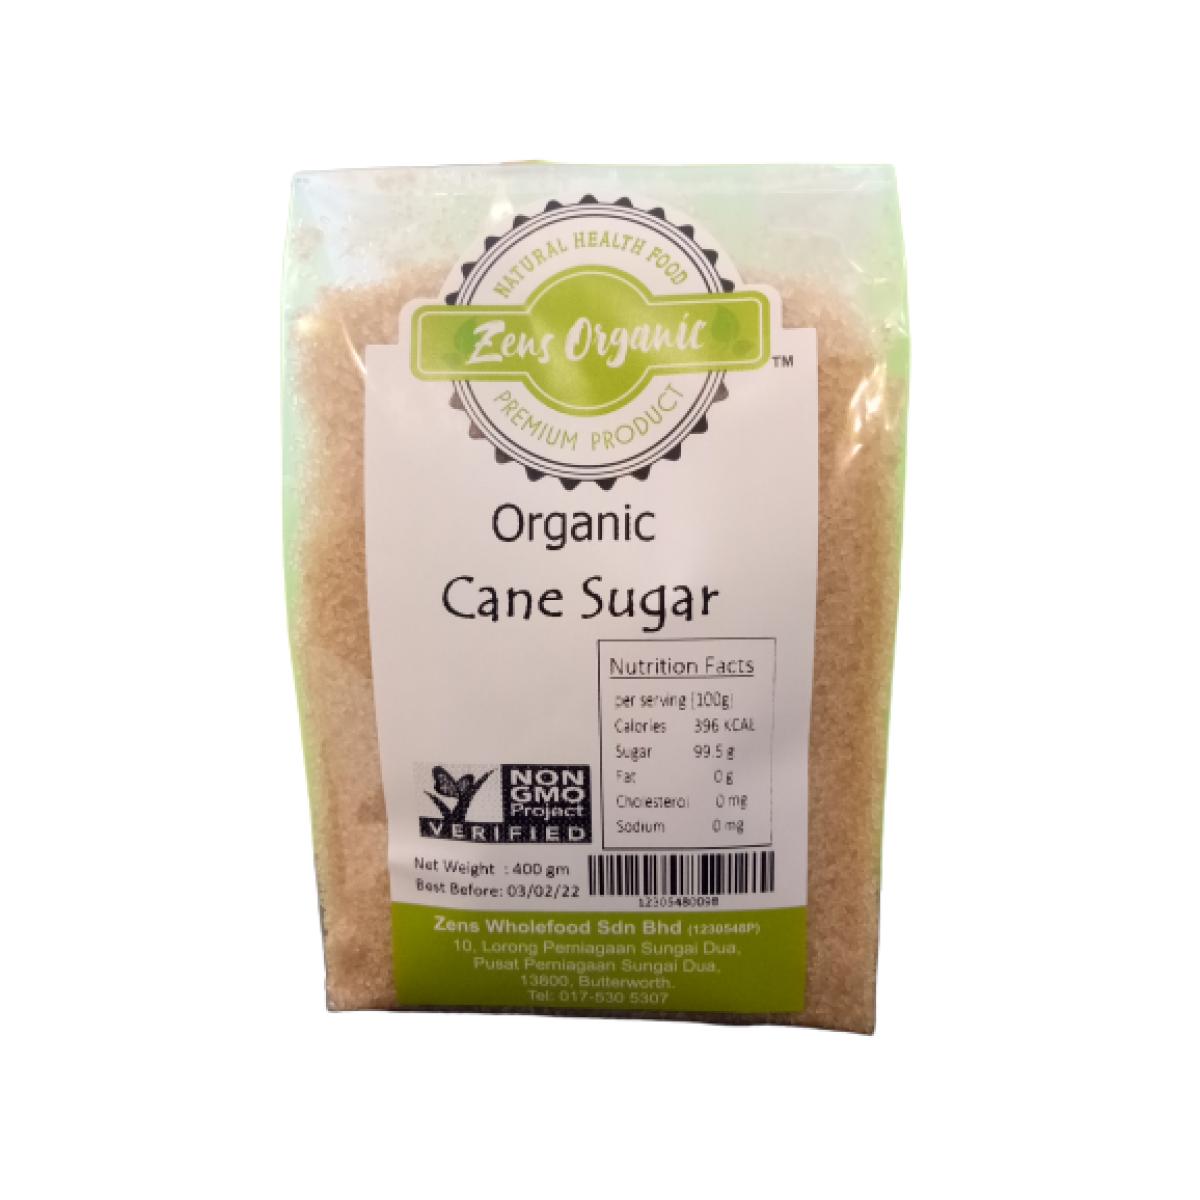 Zens Organic Cane Sugar 400g